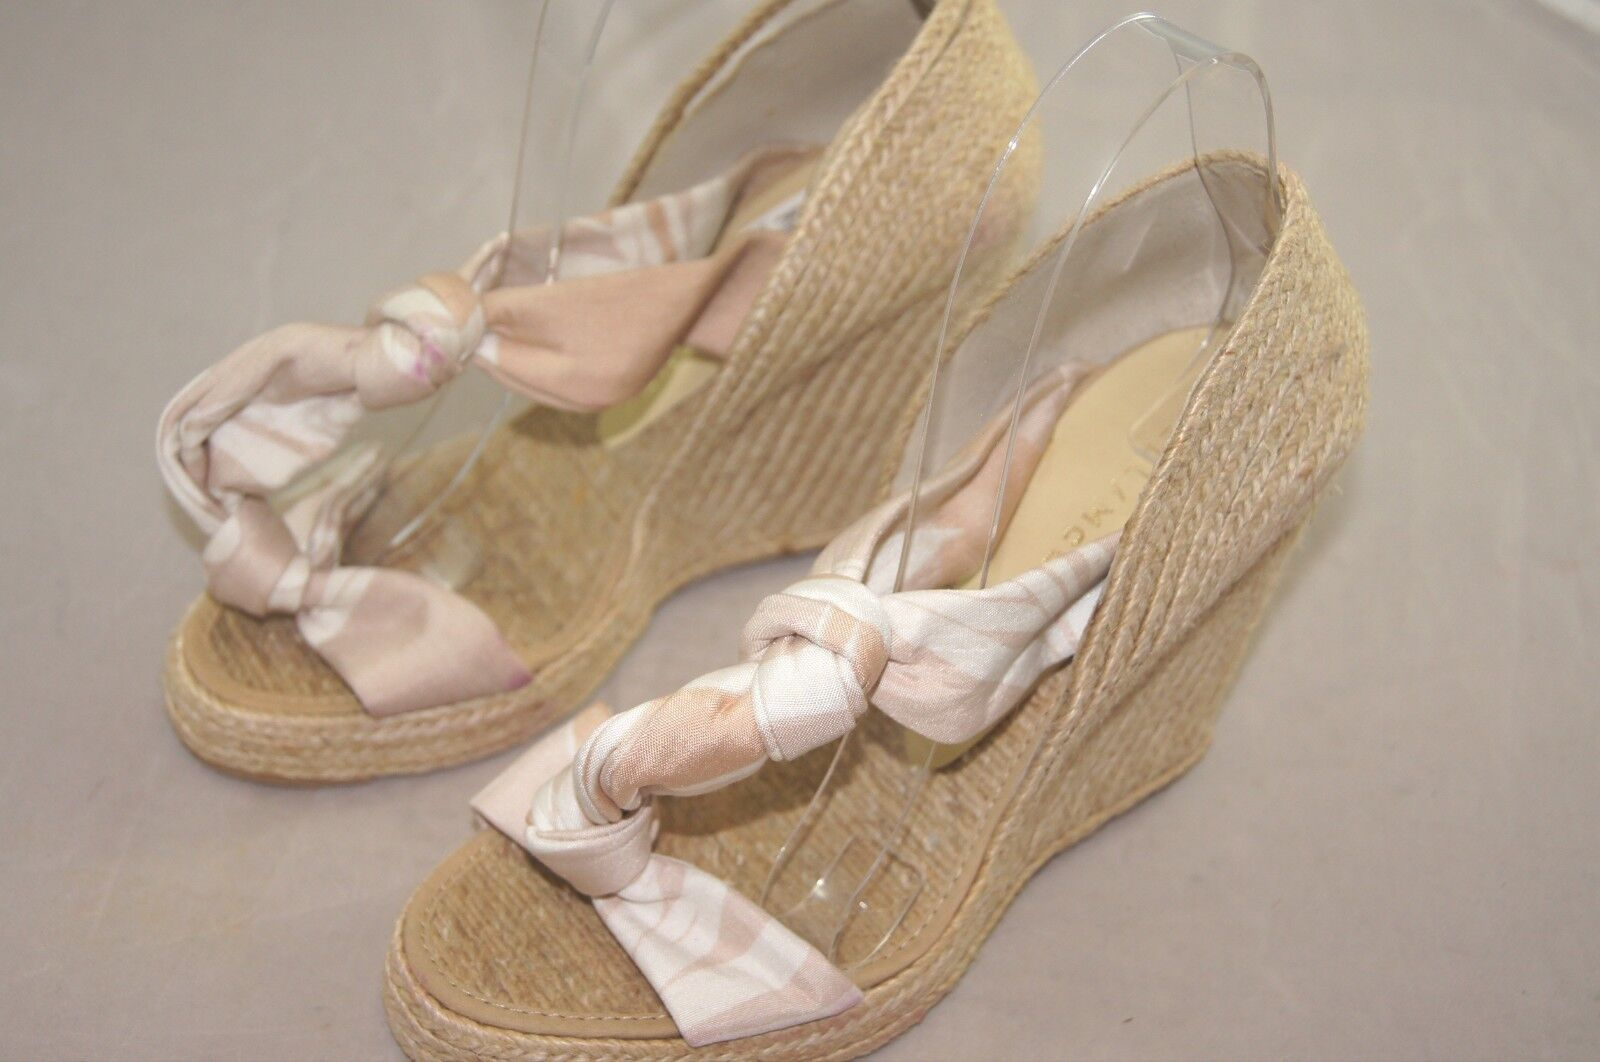 Stella McCartney Damenschuhe Schuhes Wedge Sandale Euro 38 C Made in Spain 395 h15